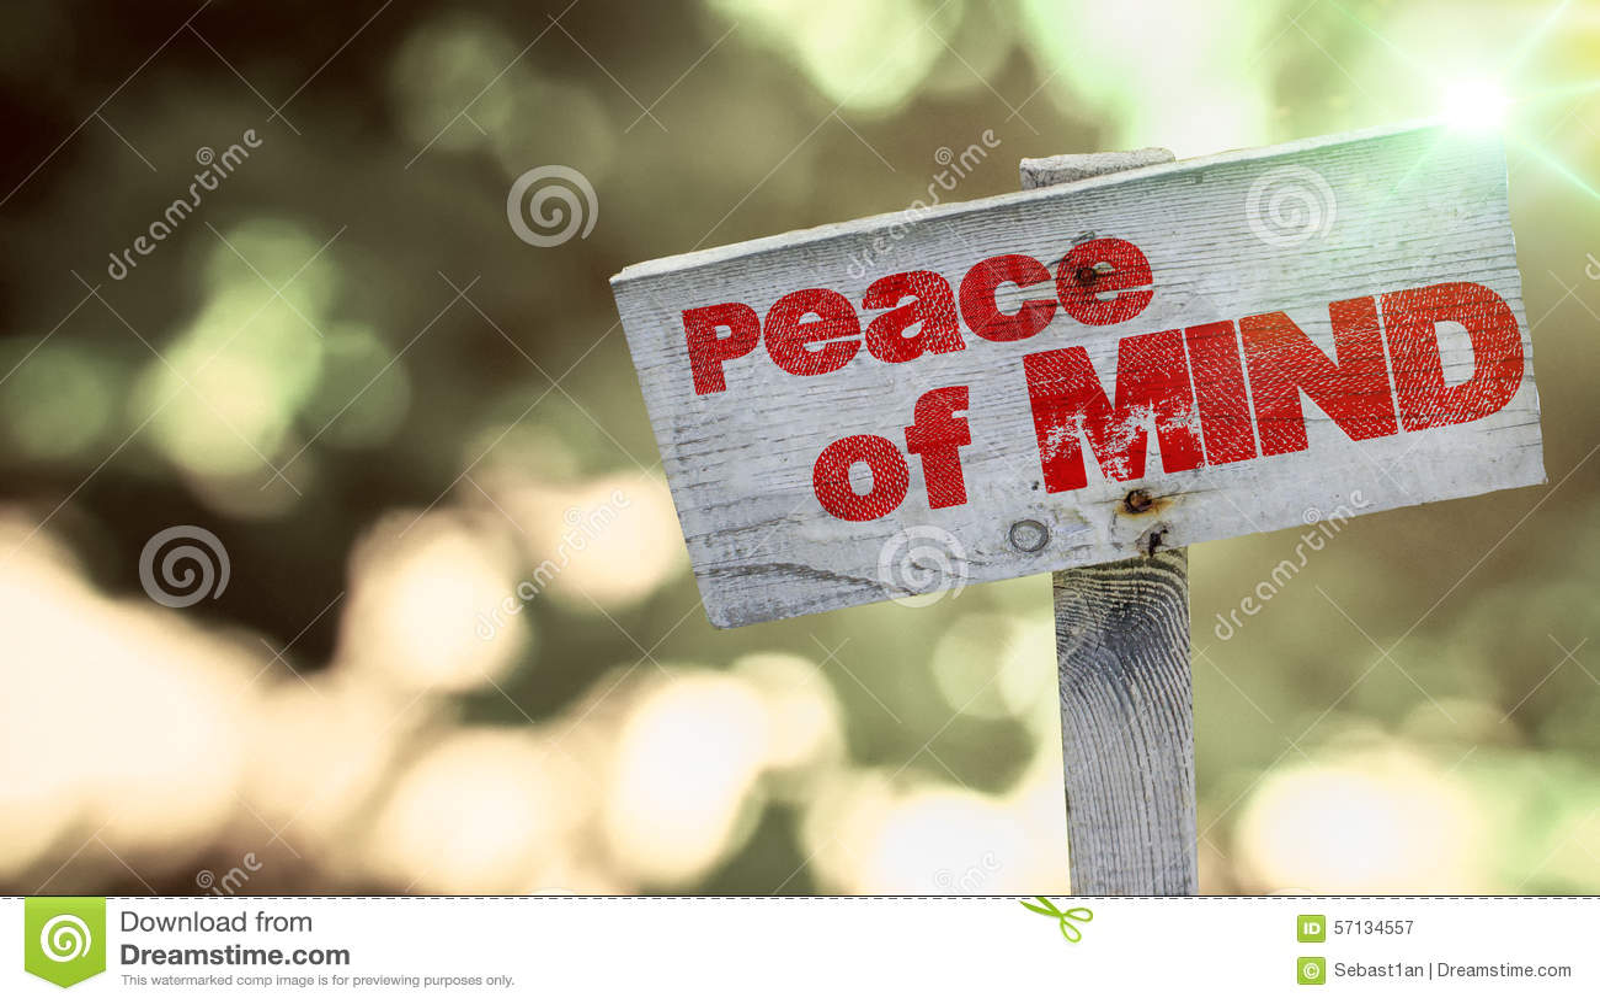 Paz de espírito